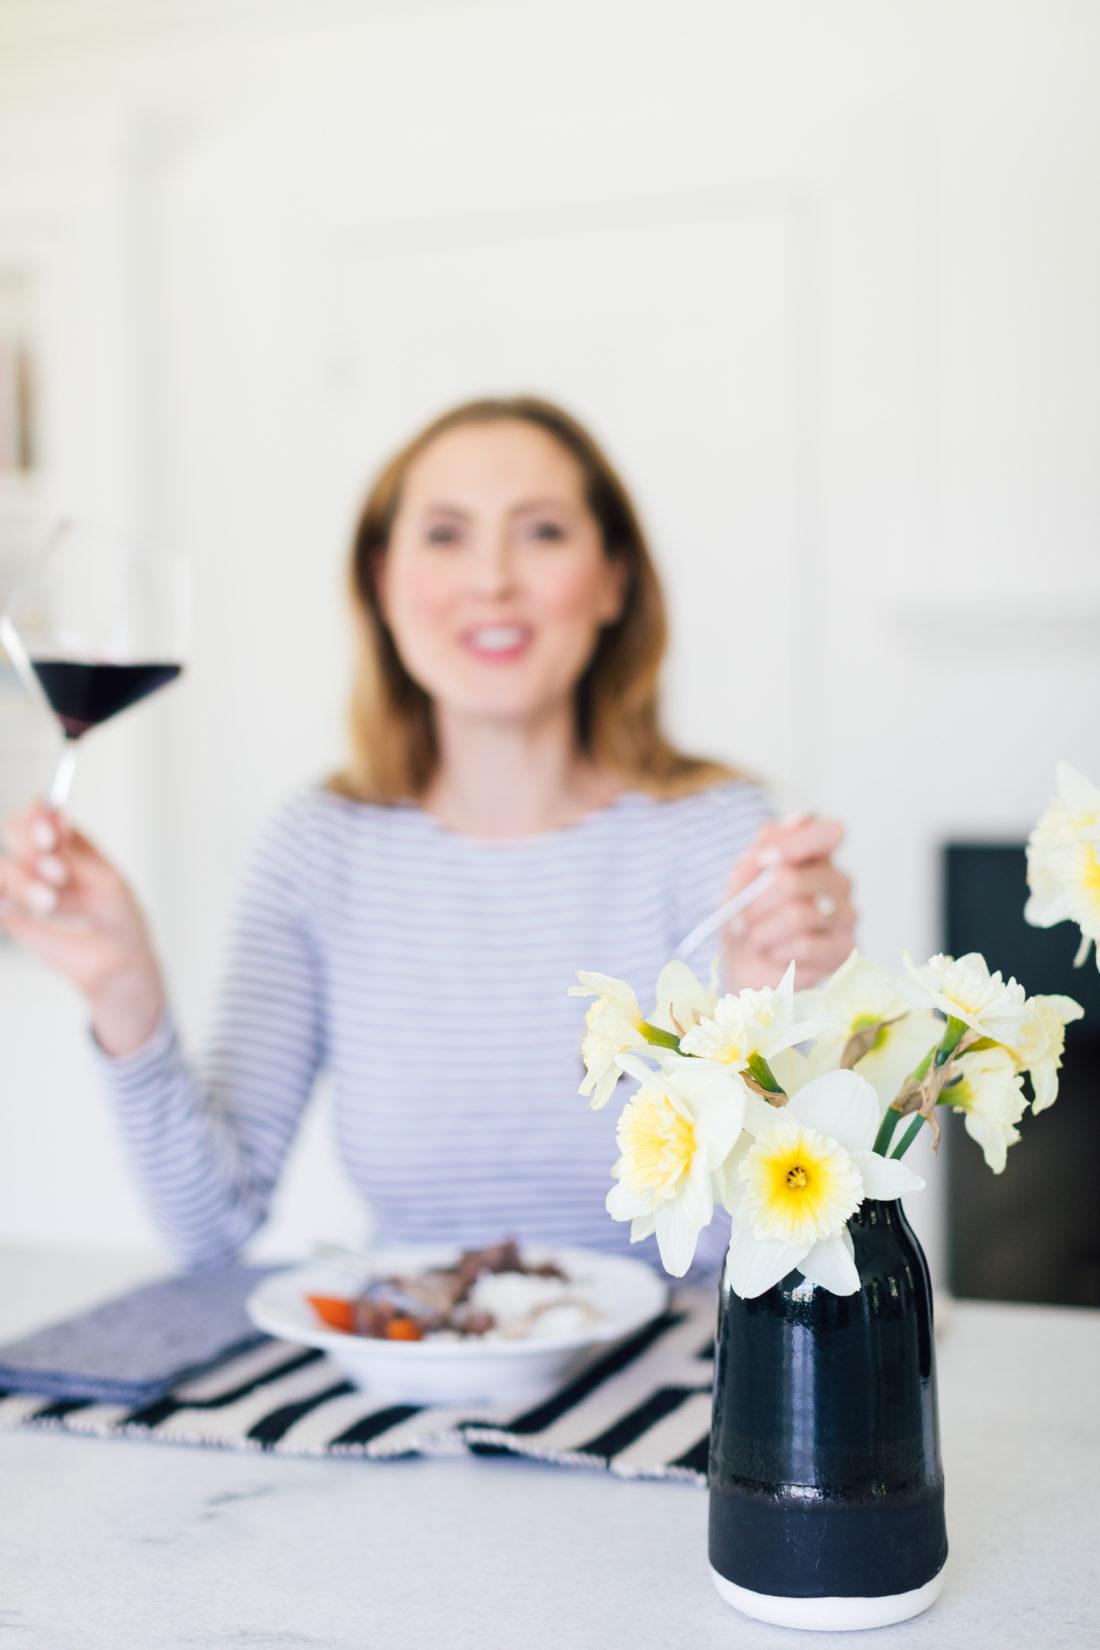 Eva Amurri Martino enjoys her Coq Au Vin